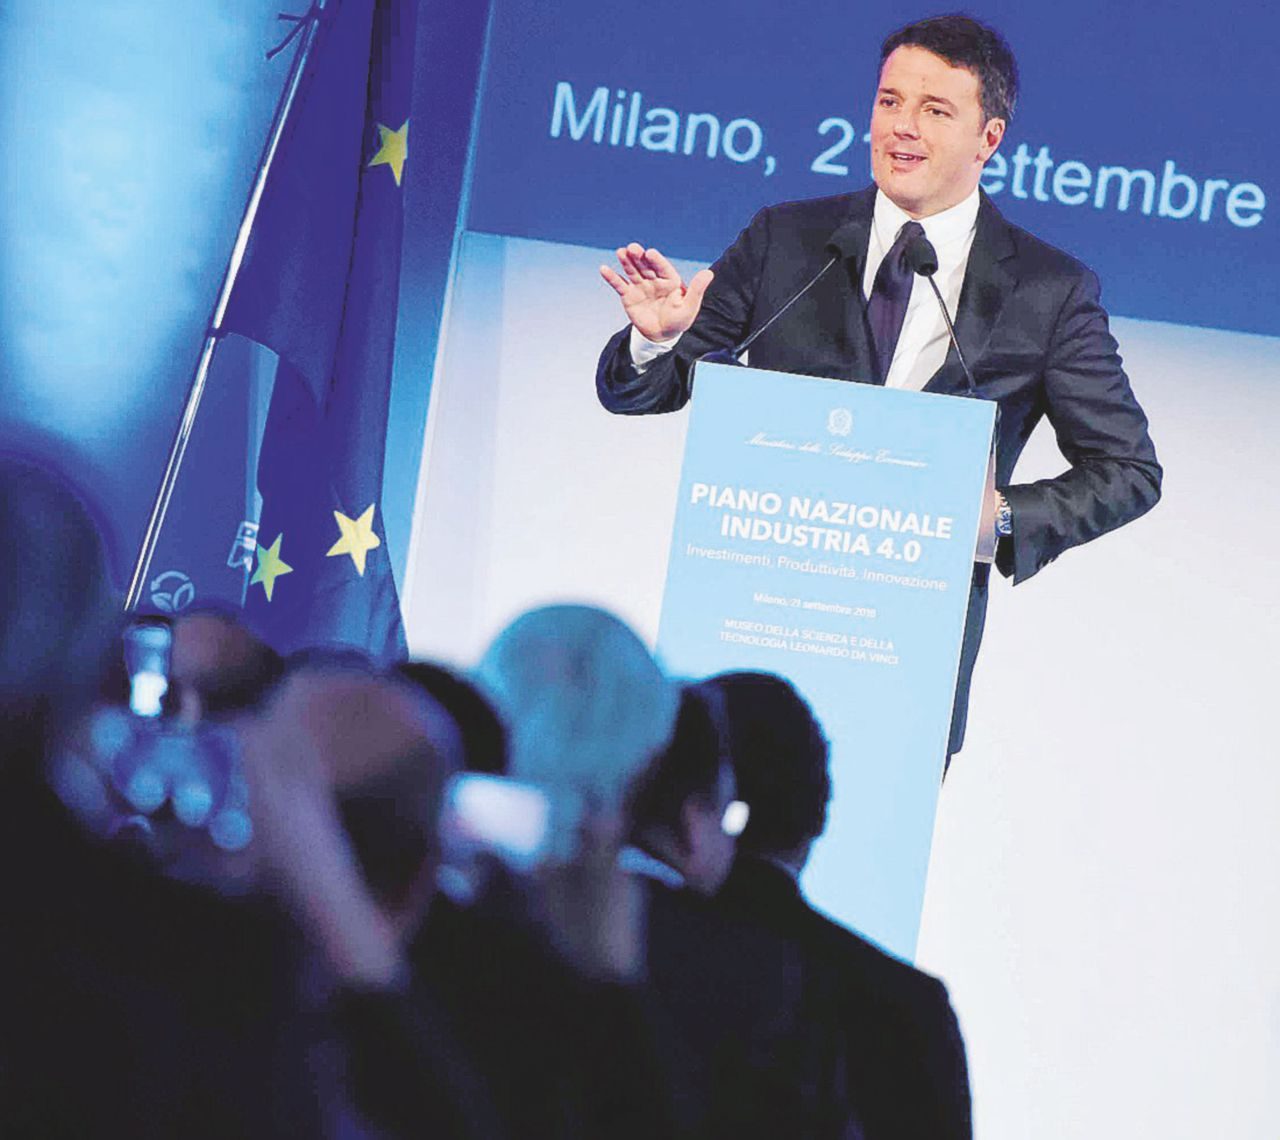 Renzi a Milano, in prima fila c'è l'indagato per corruzione